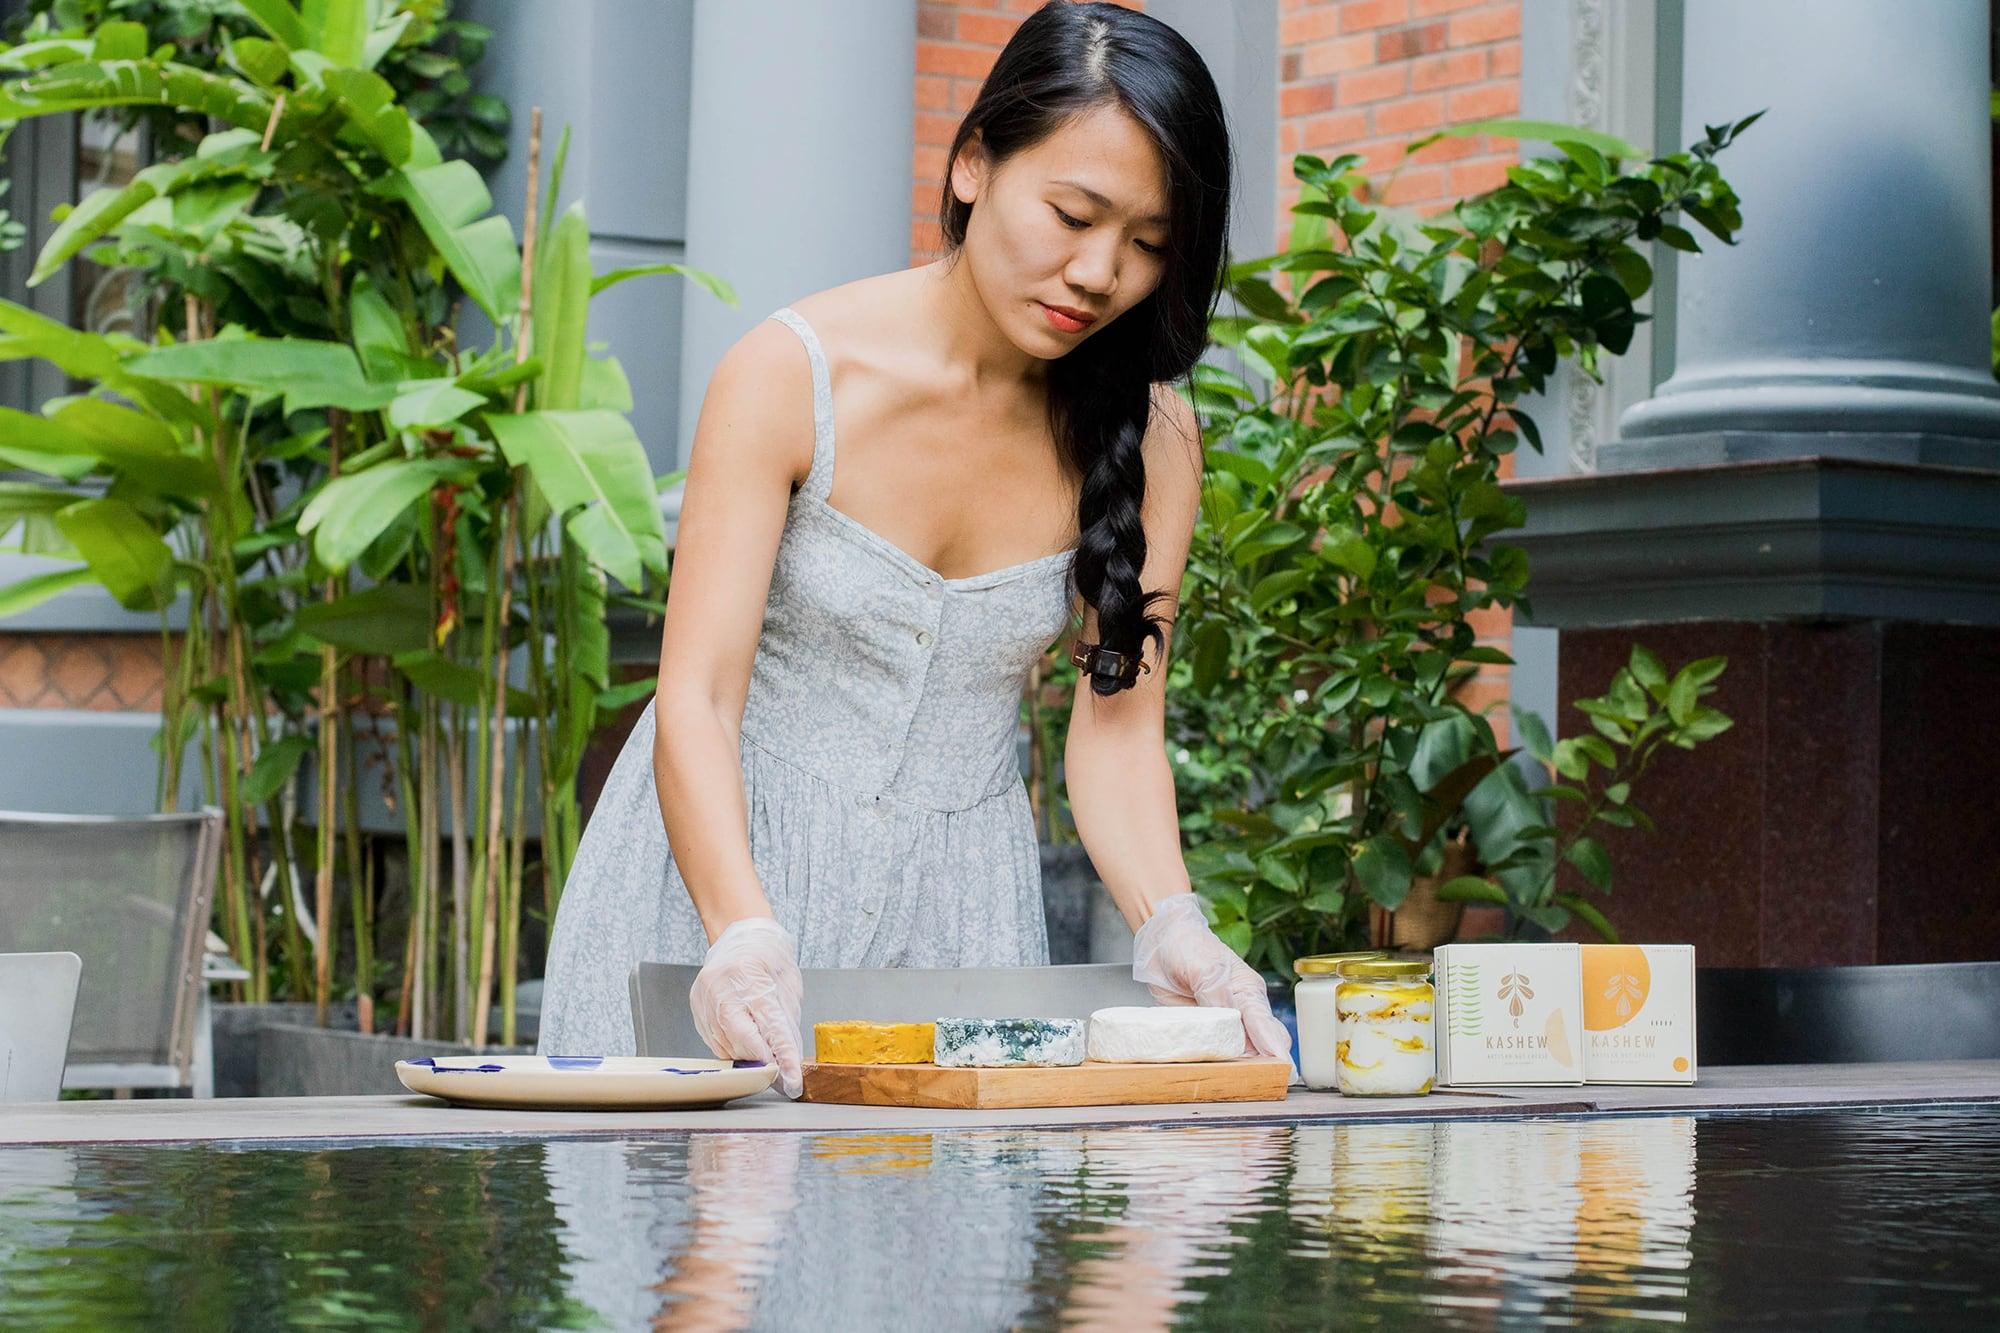 Kashew Cheese Is The Future Of Vegan Food In Vietnam